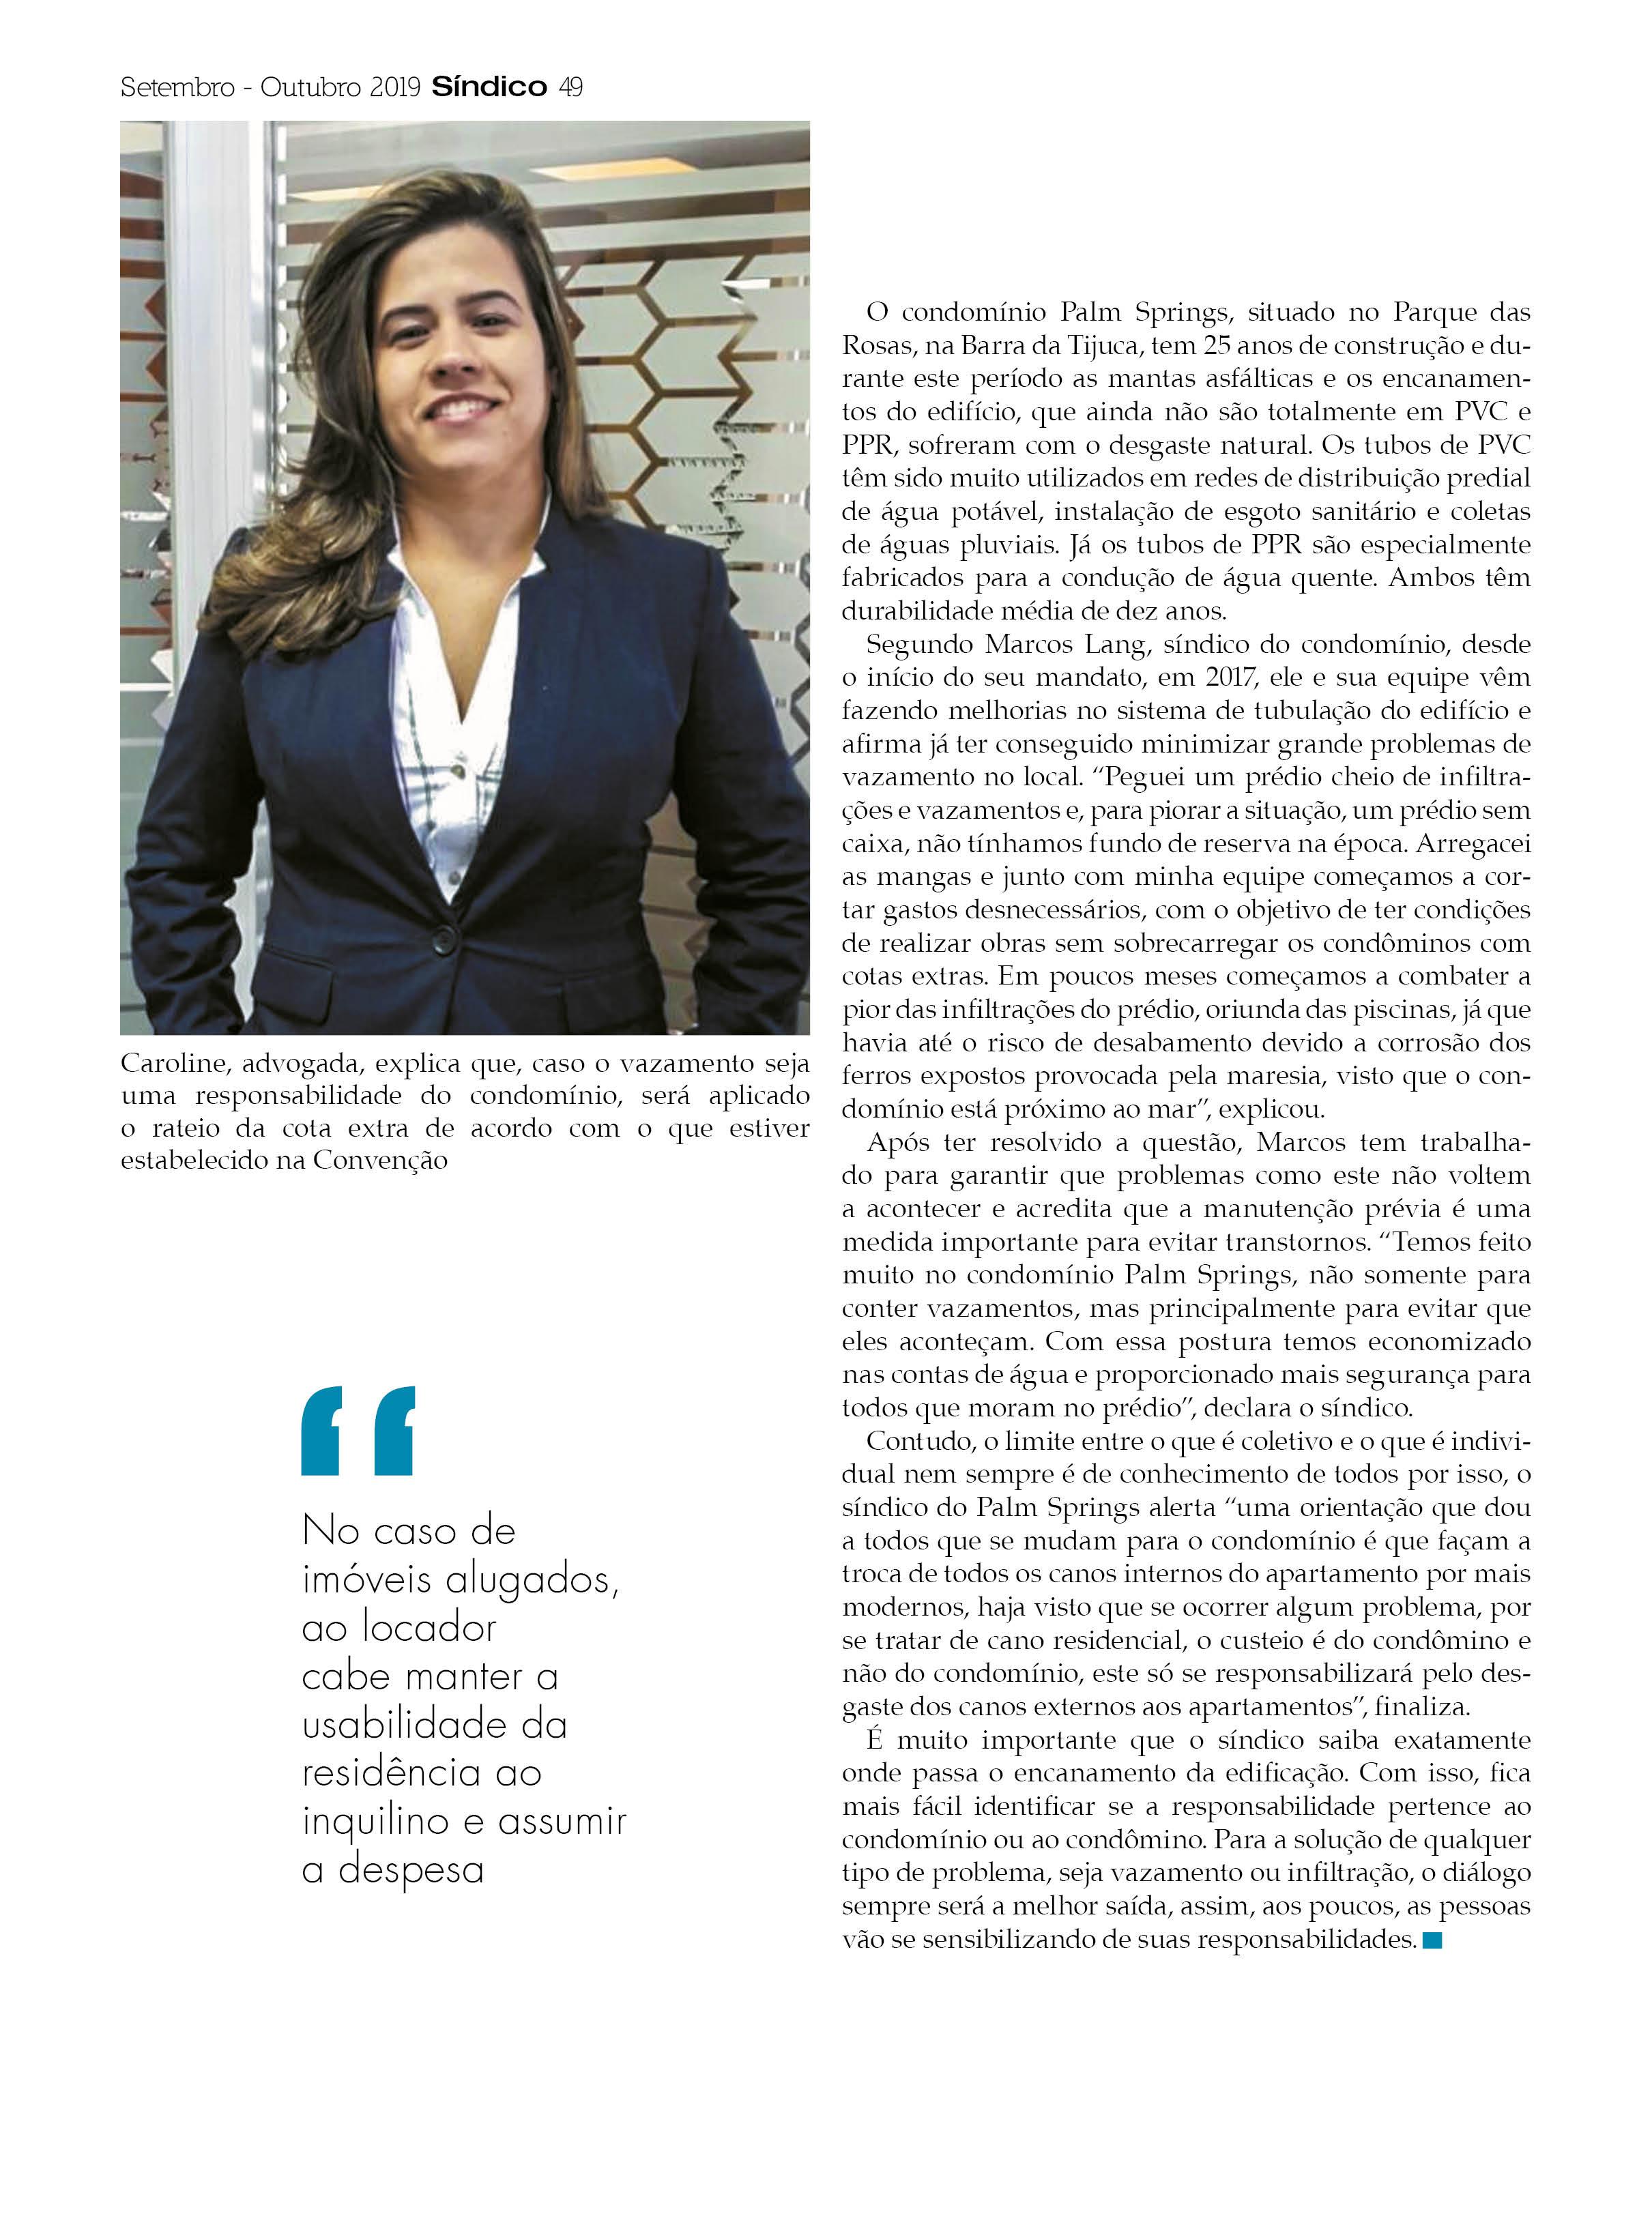 Revista Síndico_ed 246_47